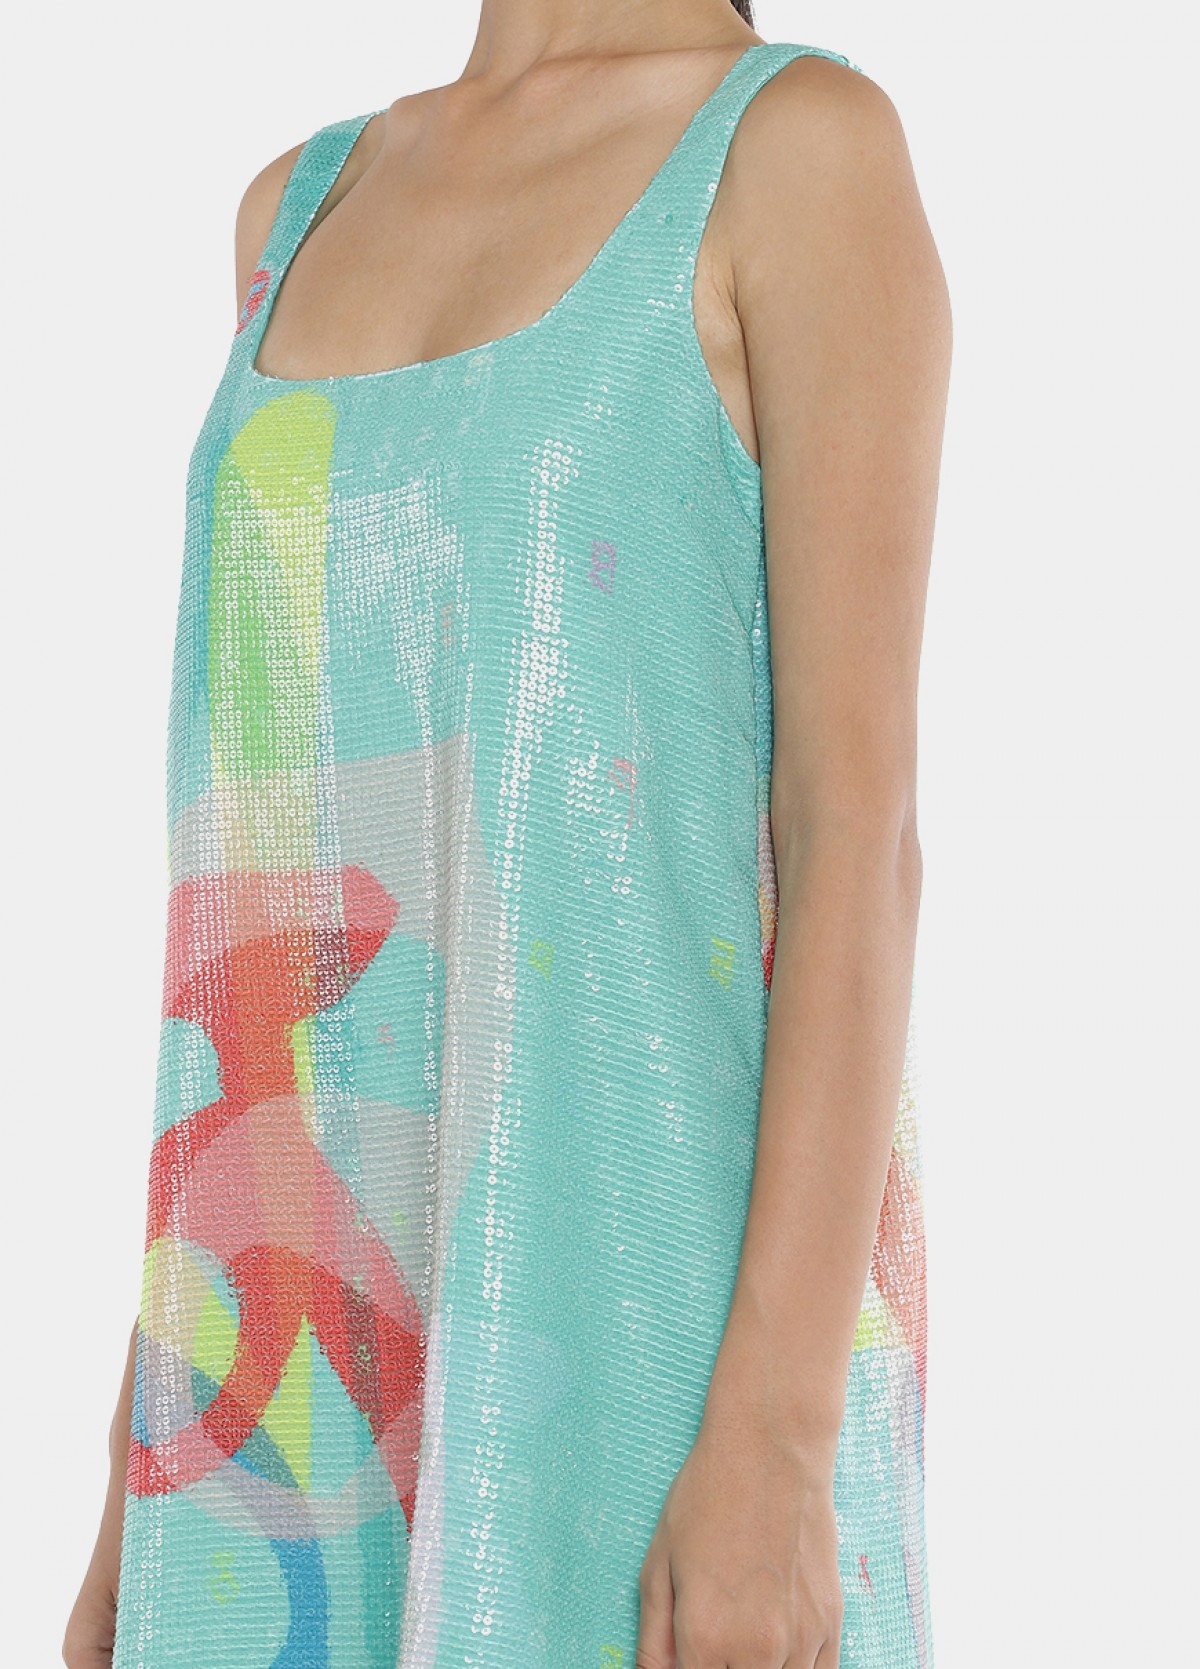 The Tropic Of Capricorn Dress